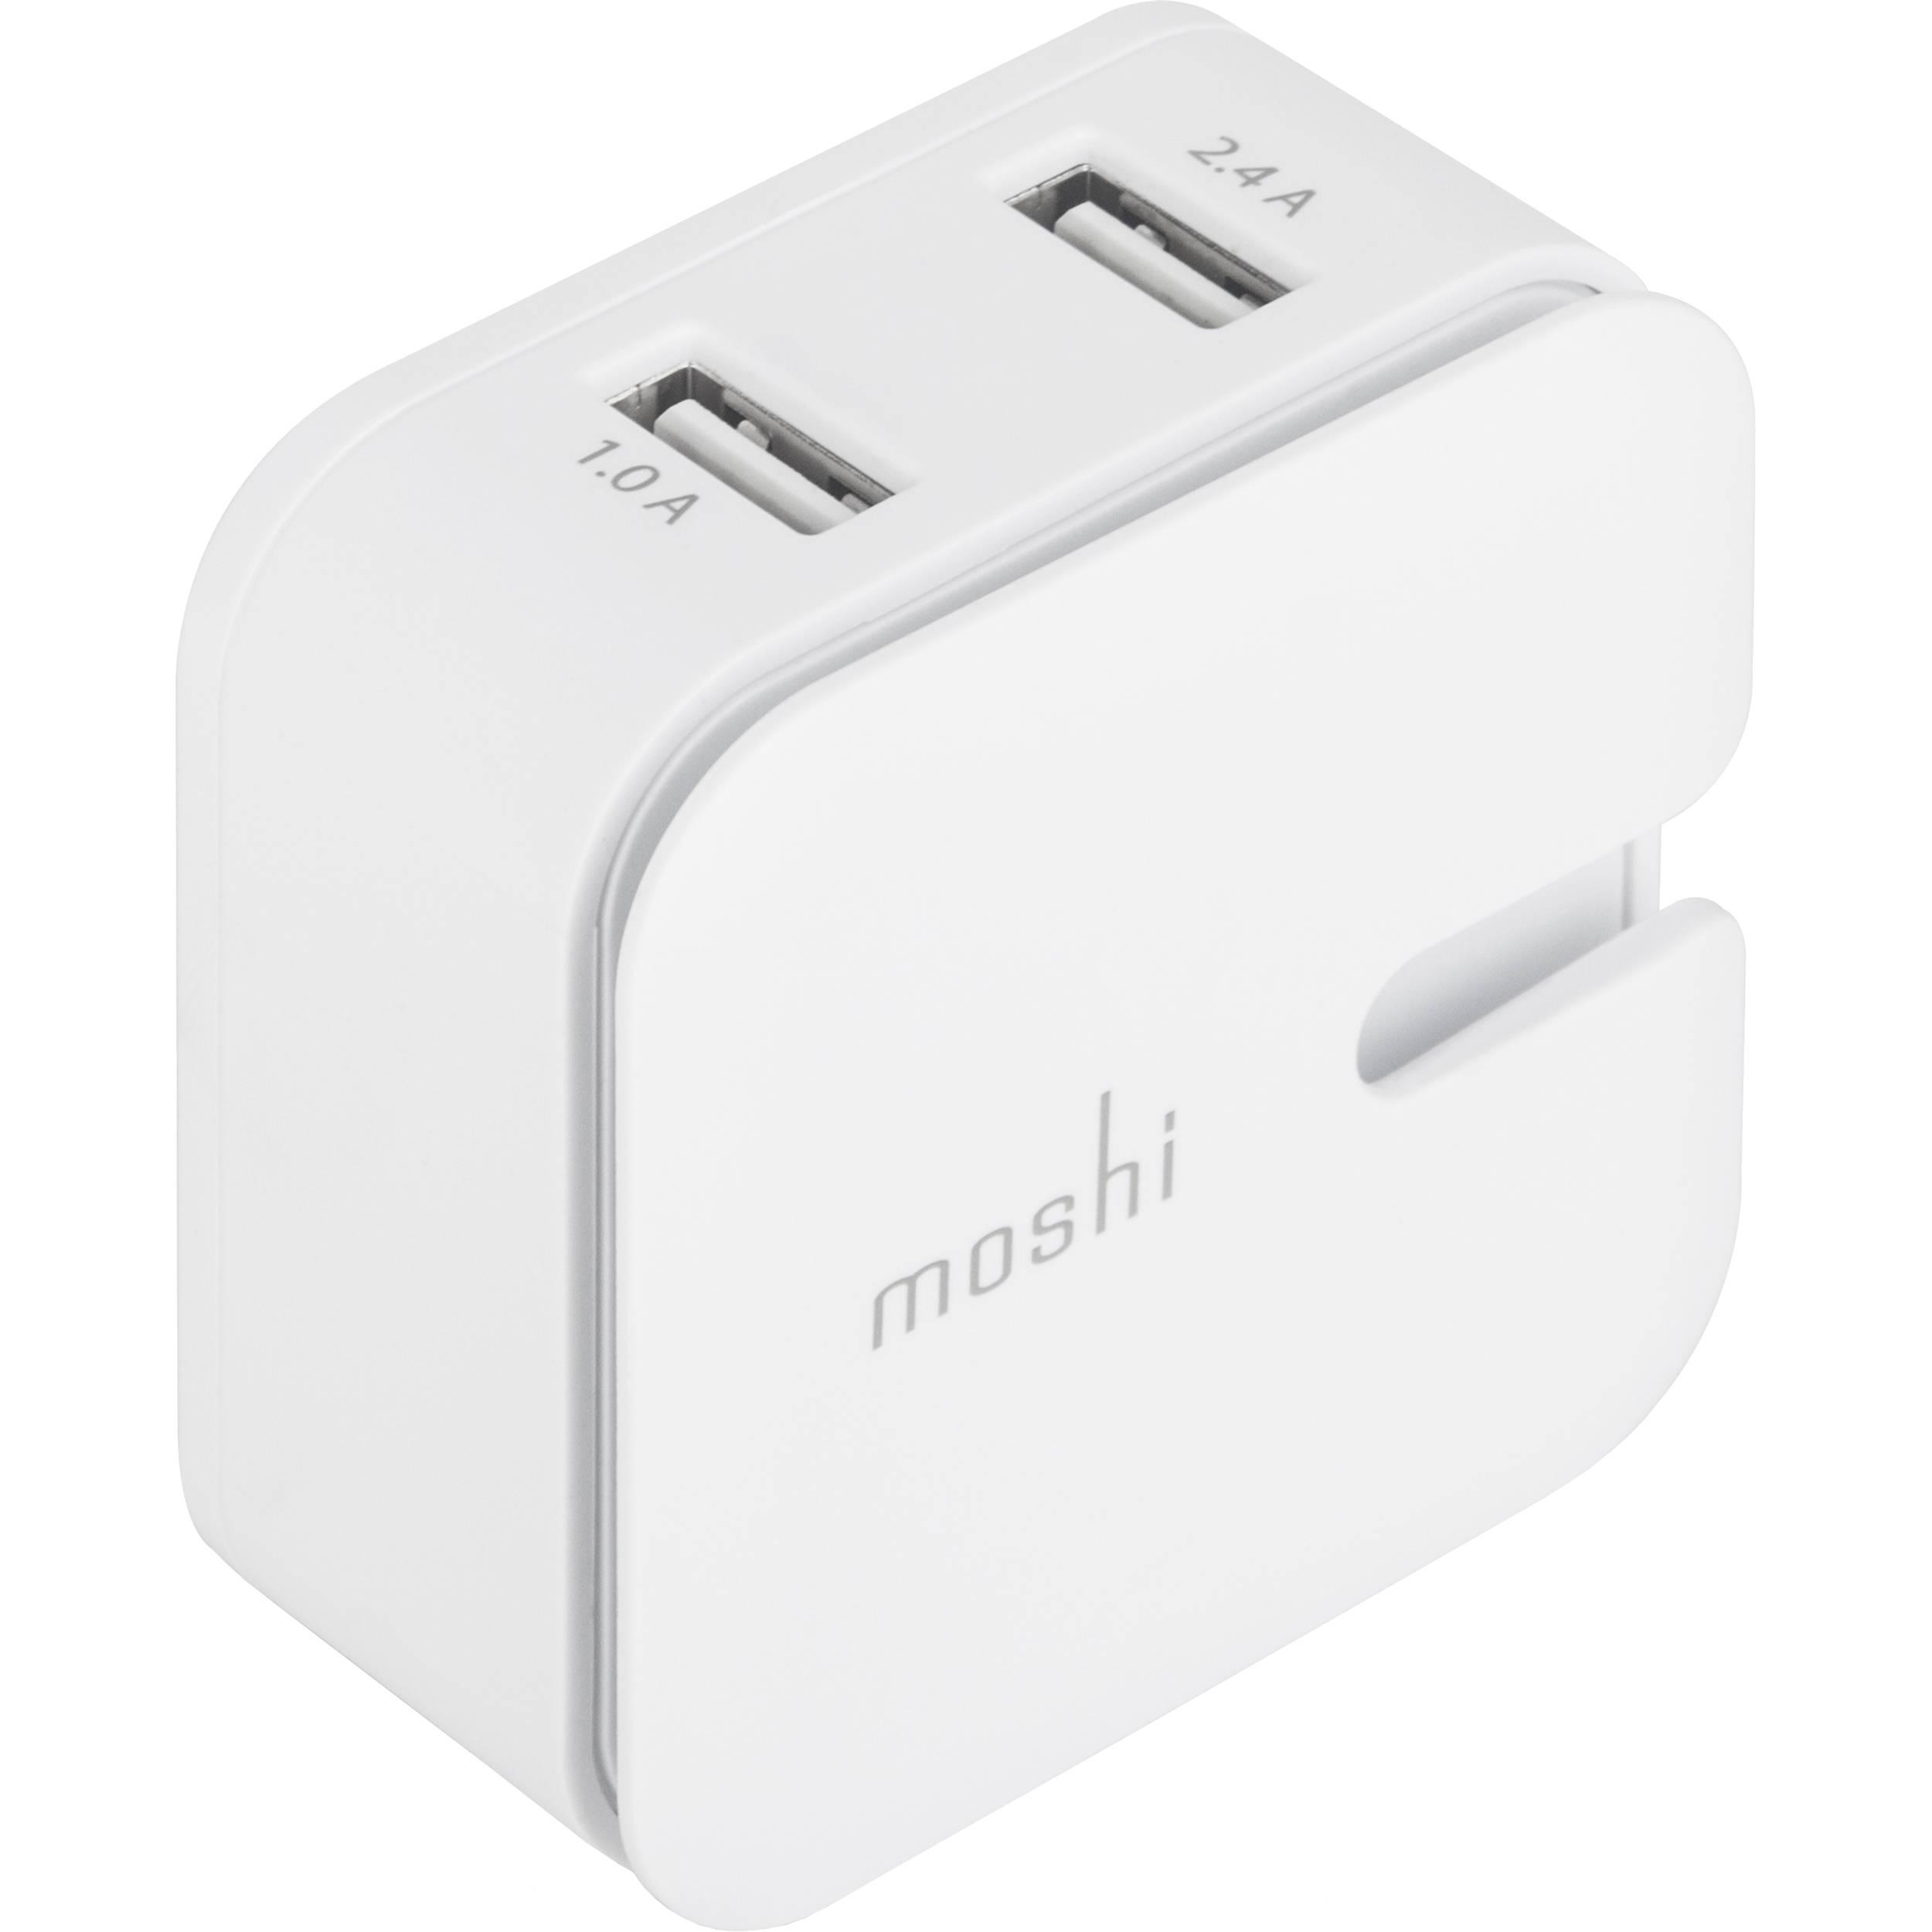 Moshi Rewind 2 Dual Port Usb Wall Charger 99mo022111 Bh Photo